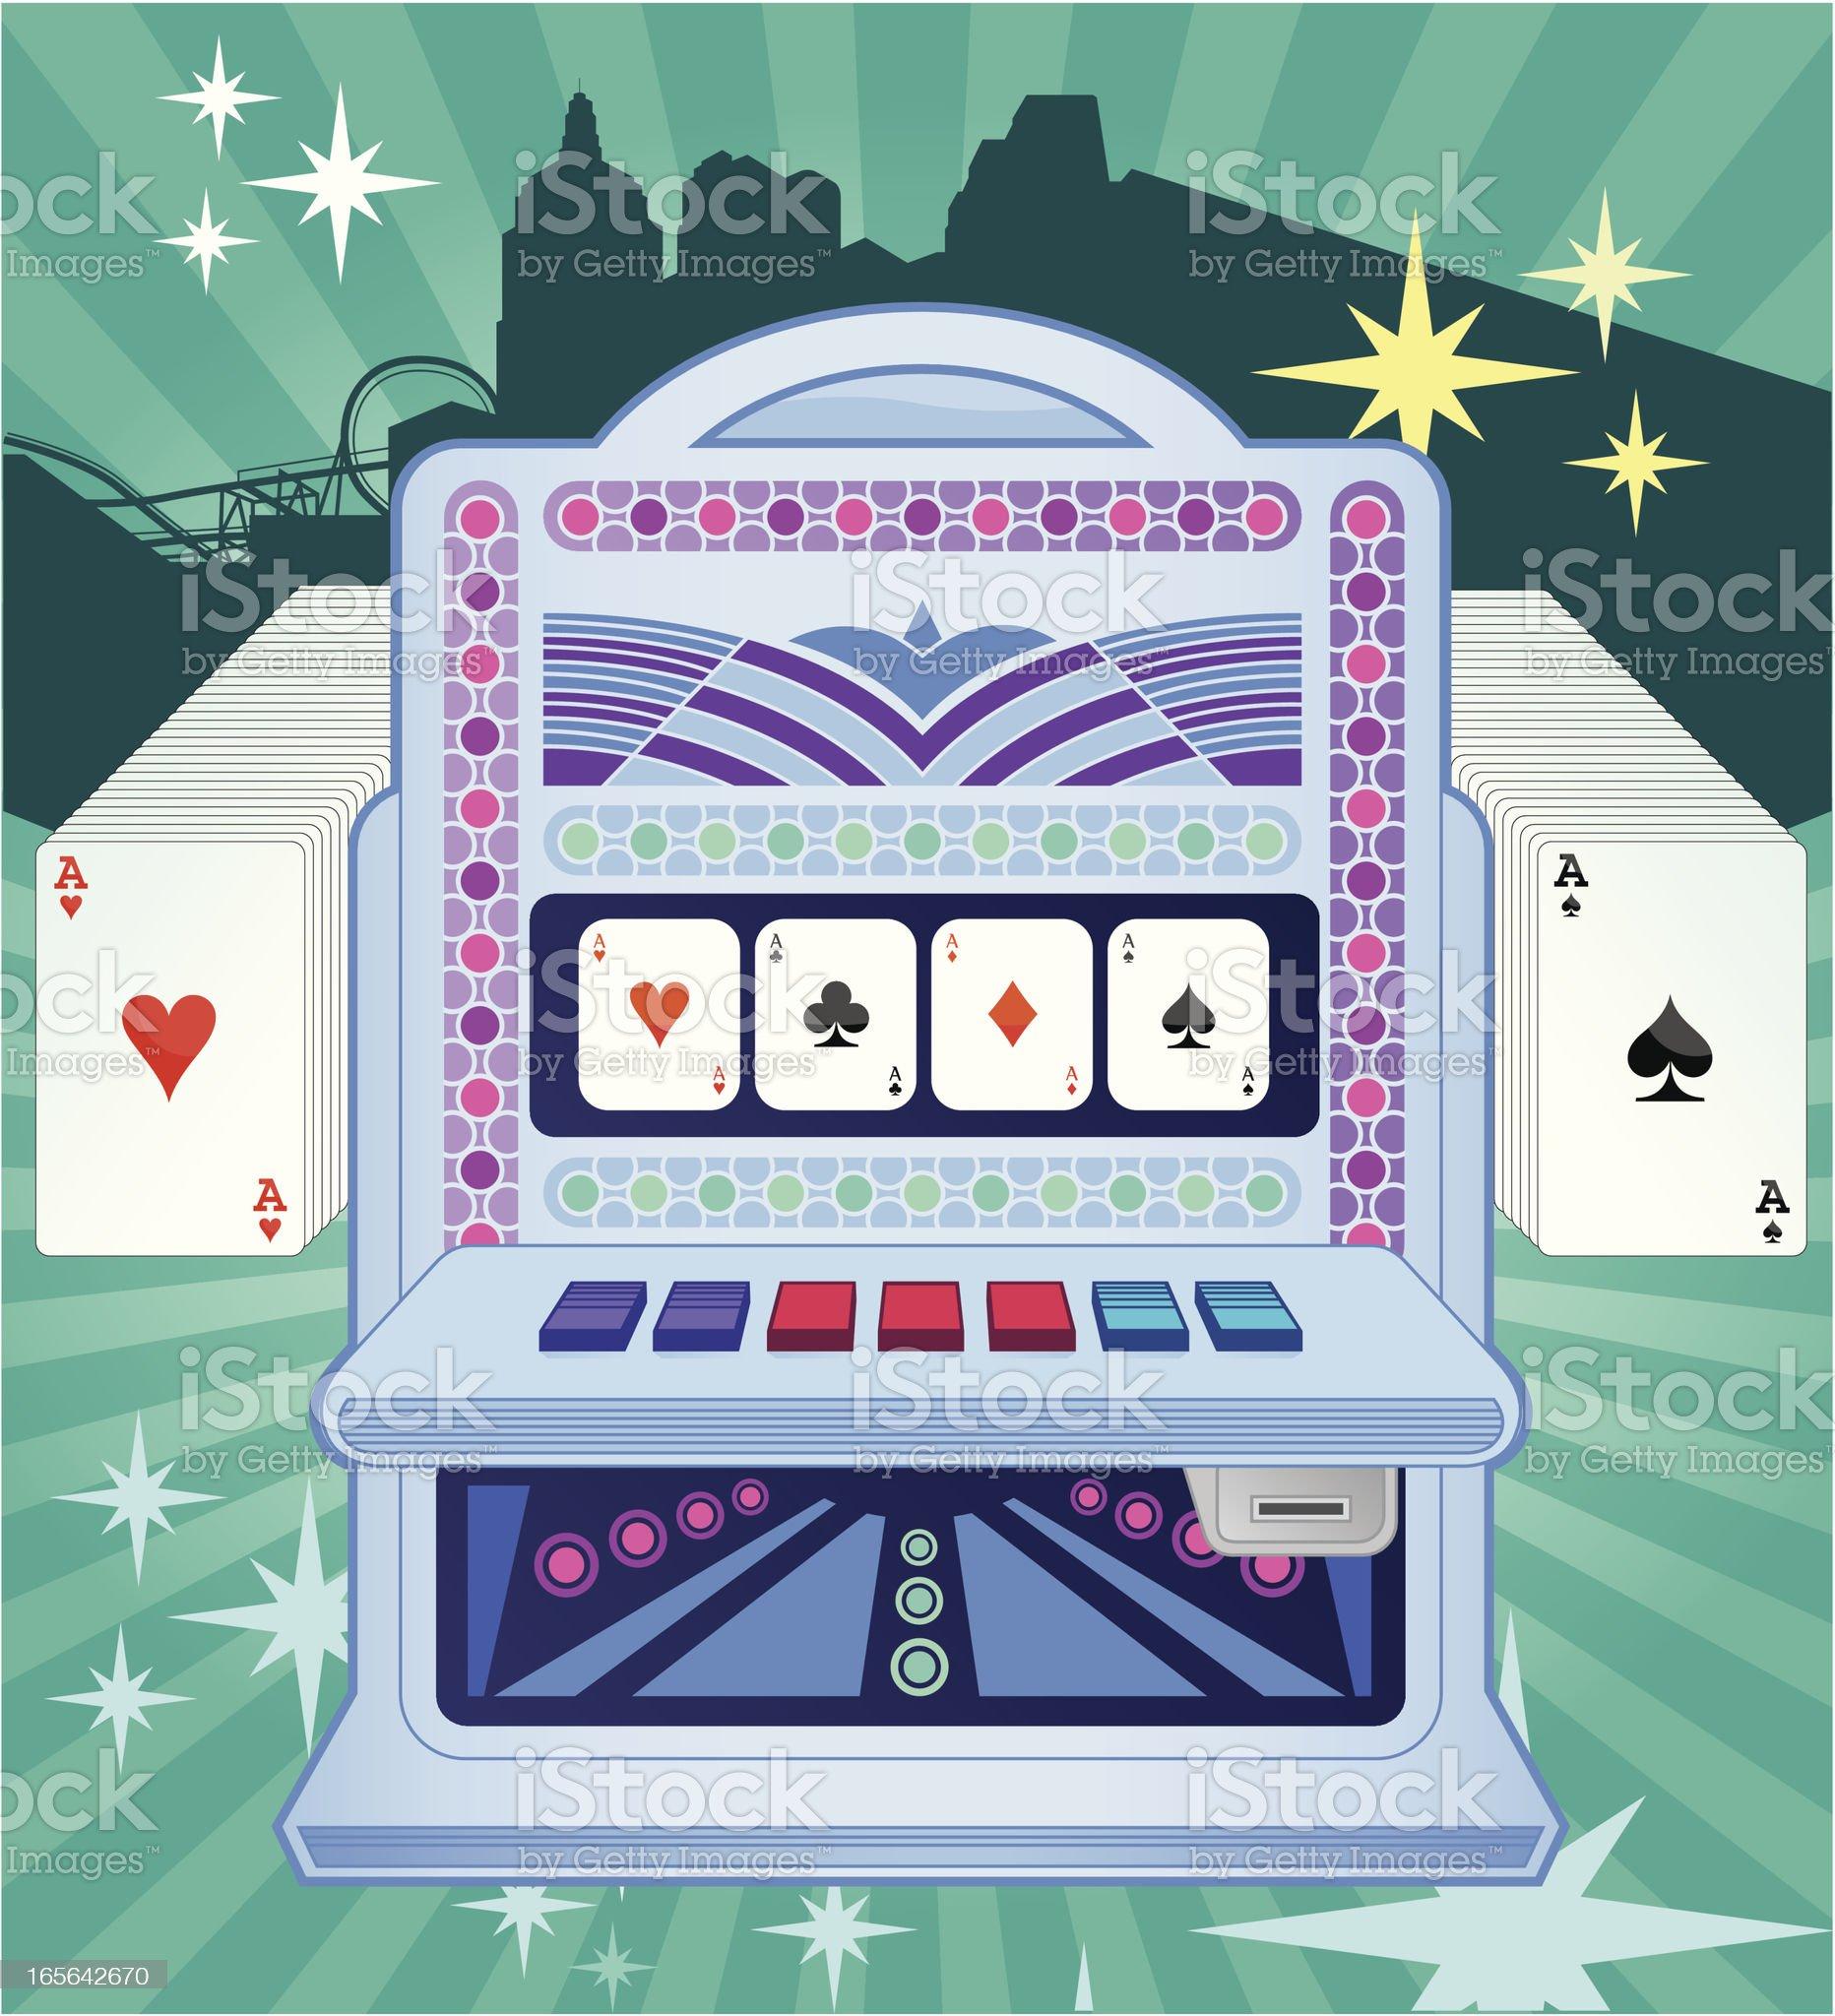 Gaming royalty-free stock vector art